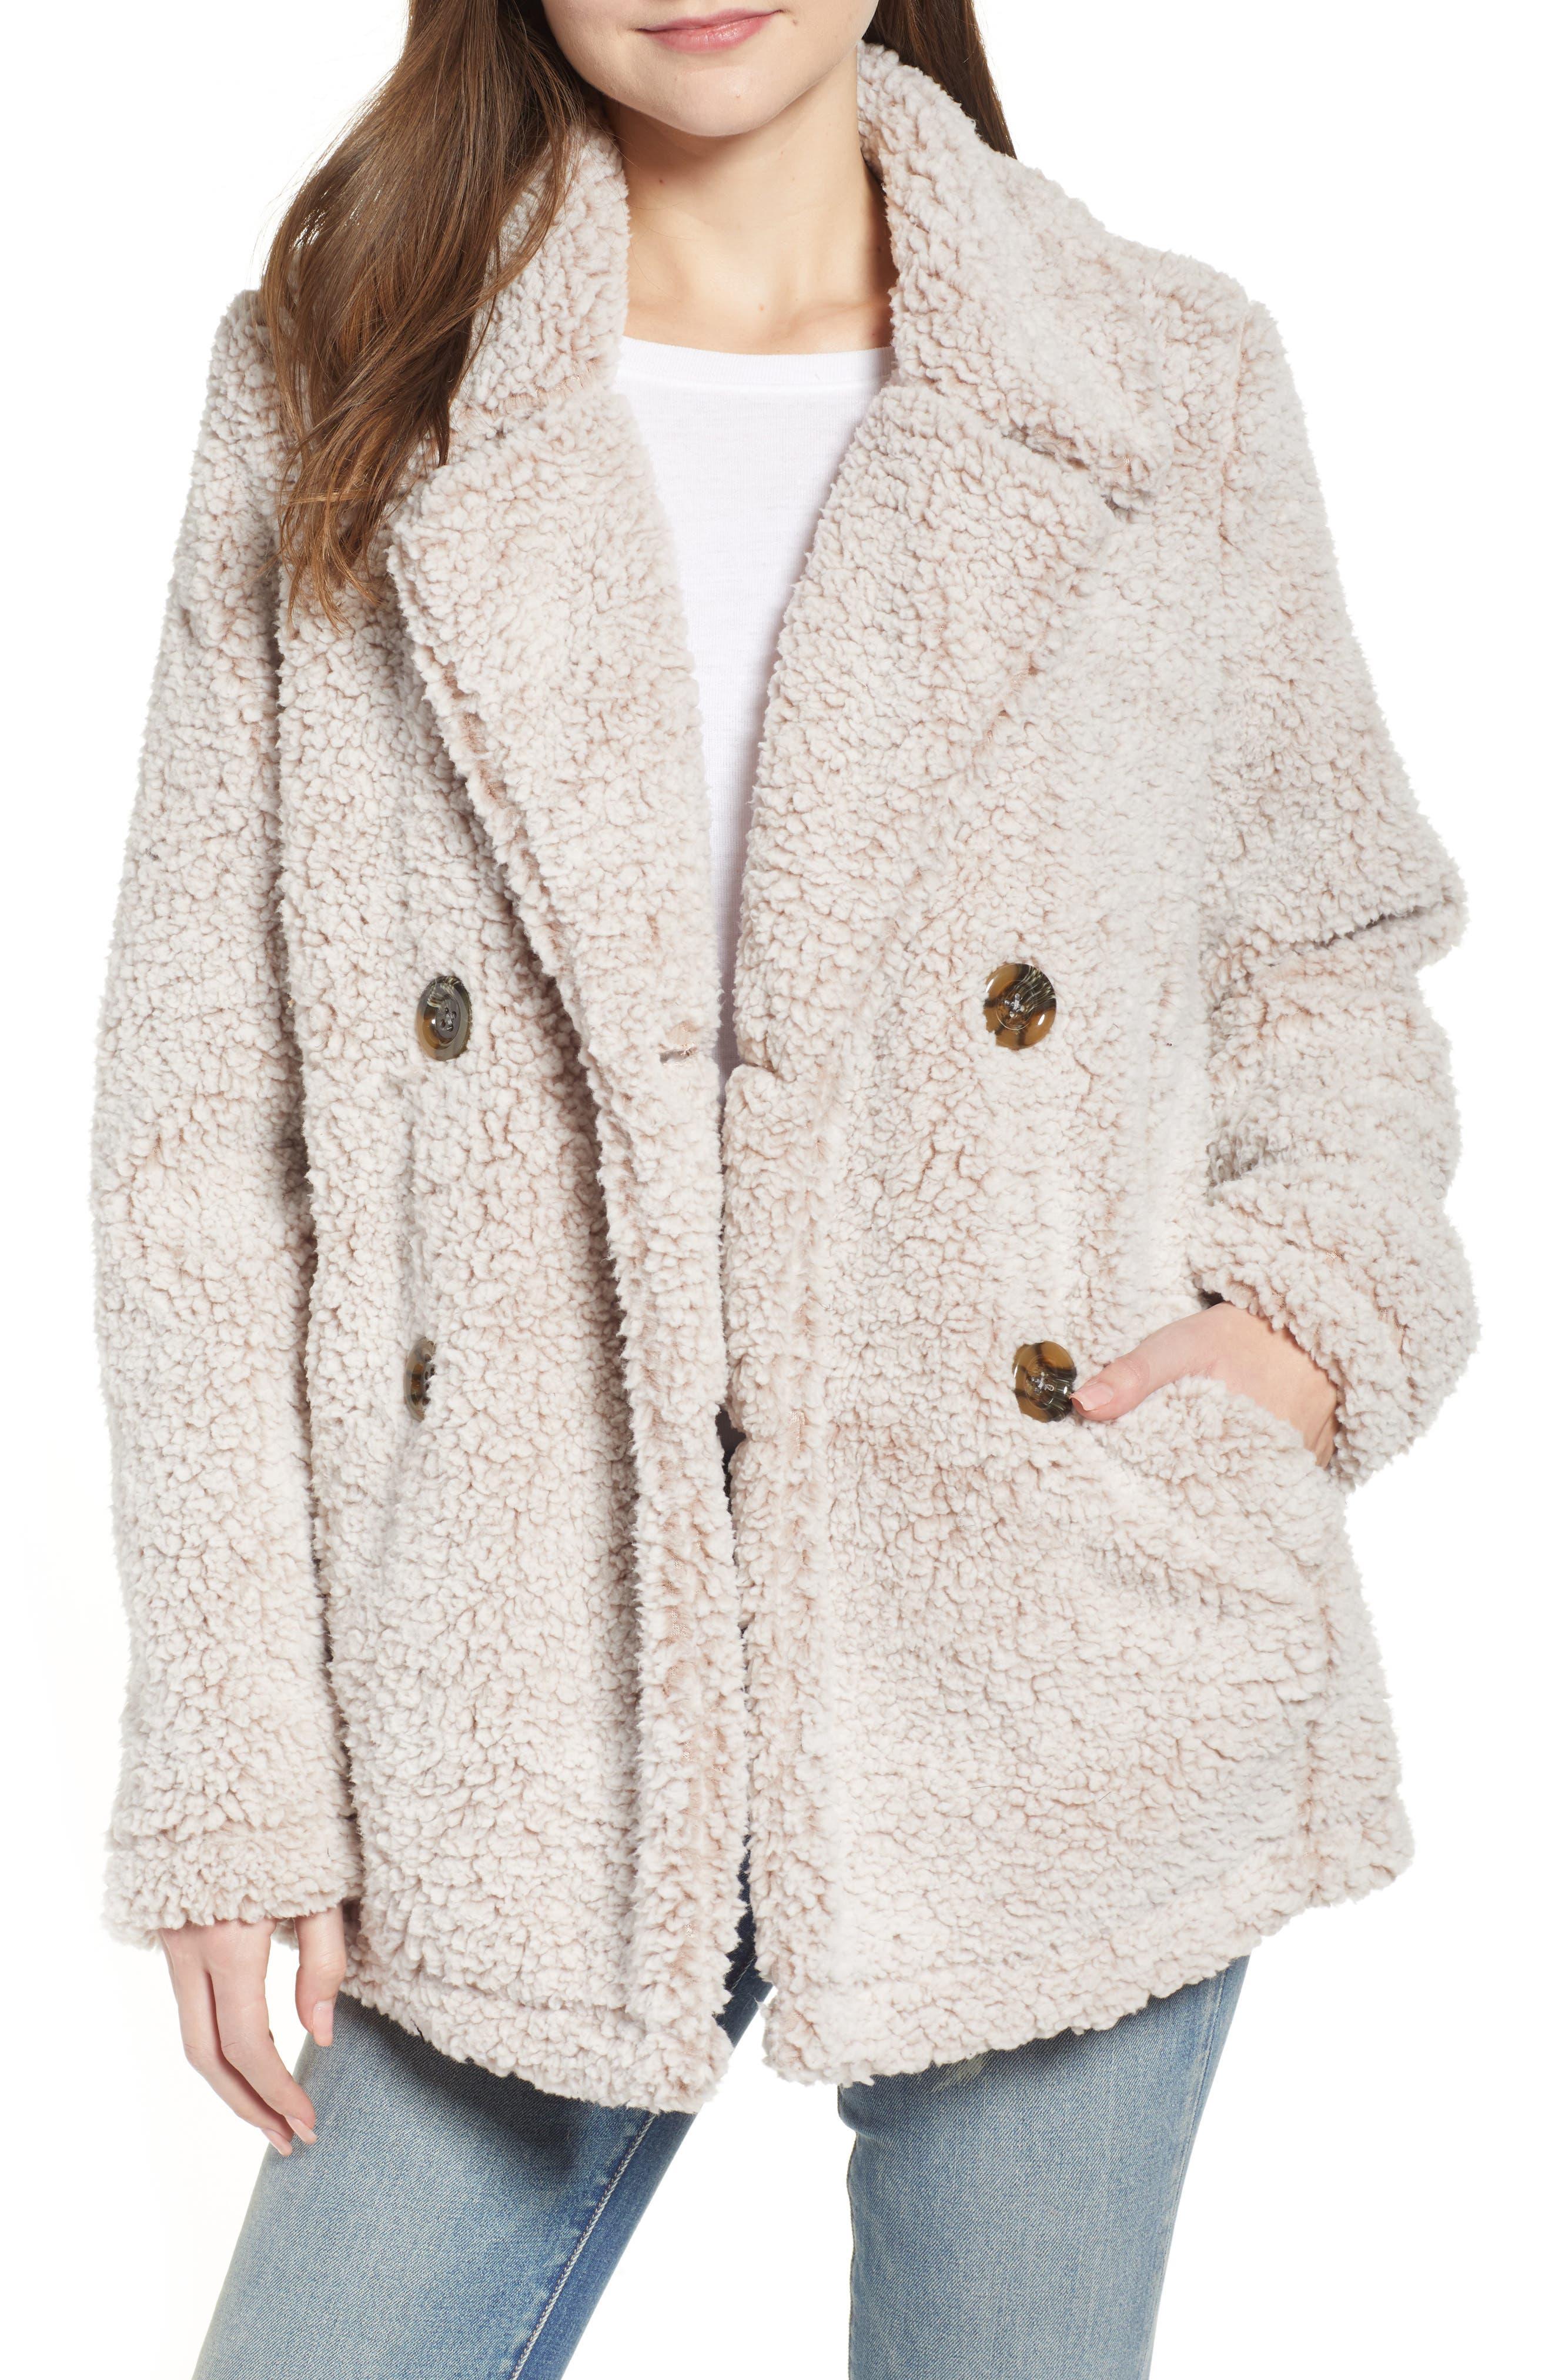 THREAD & SUPPLY, Double Breasted Fleece Coat, Main thumbnail 1, color, SMOKE ROSE